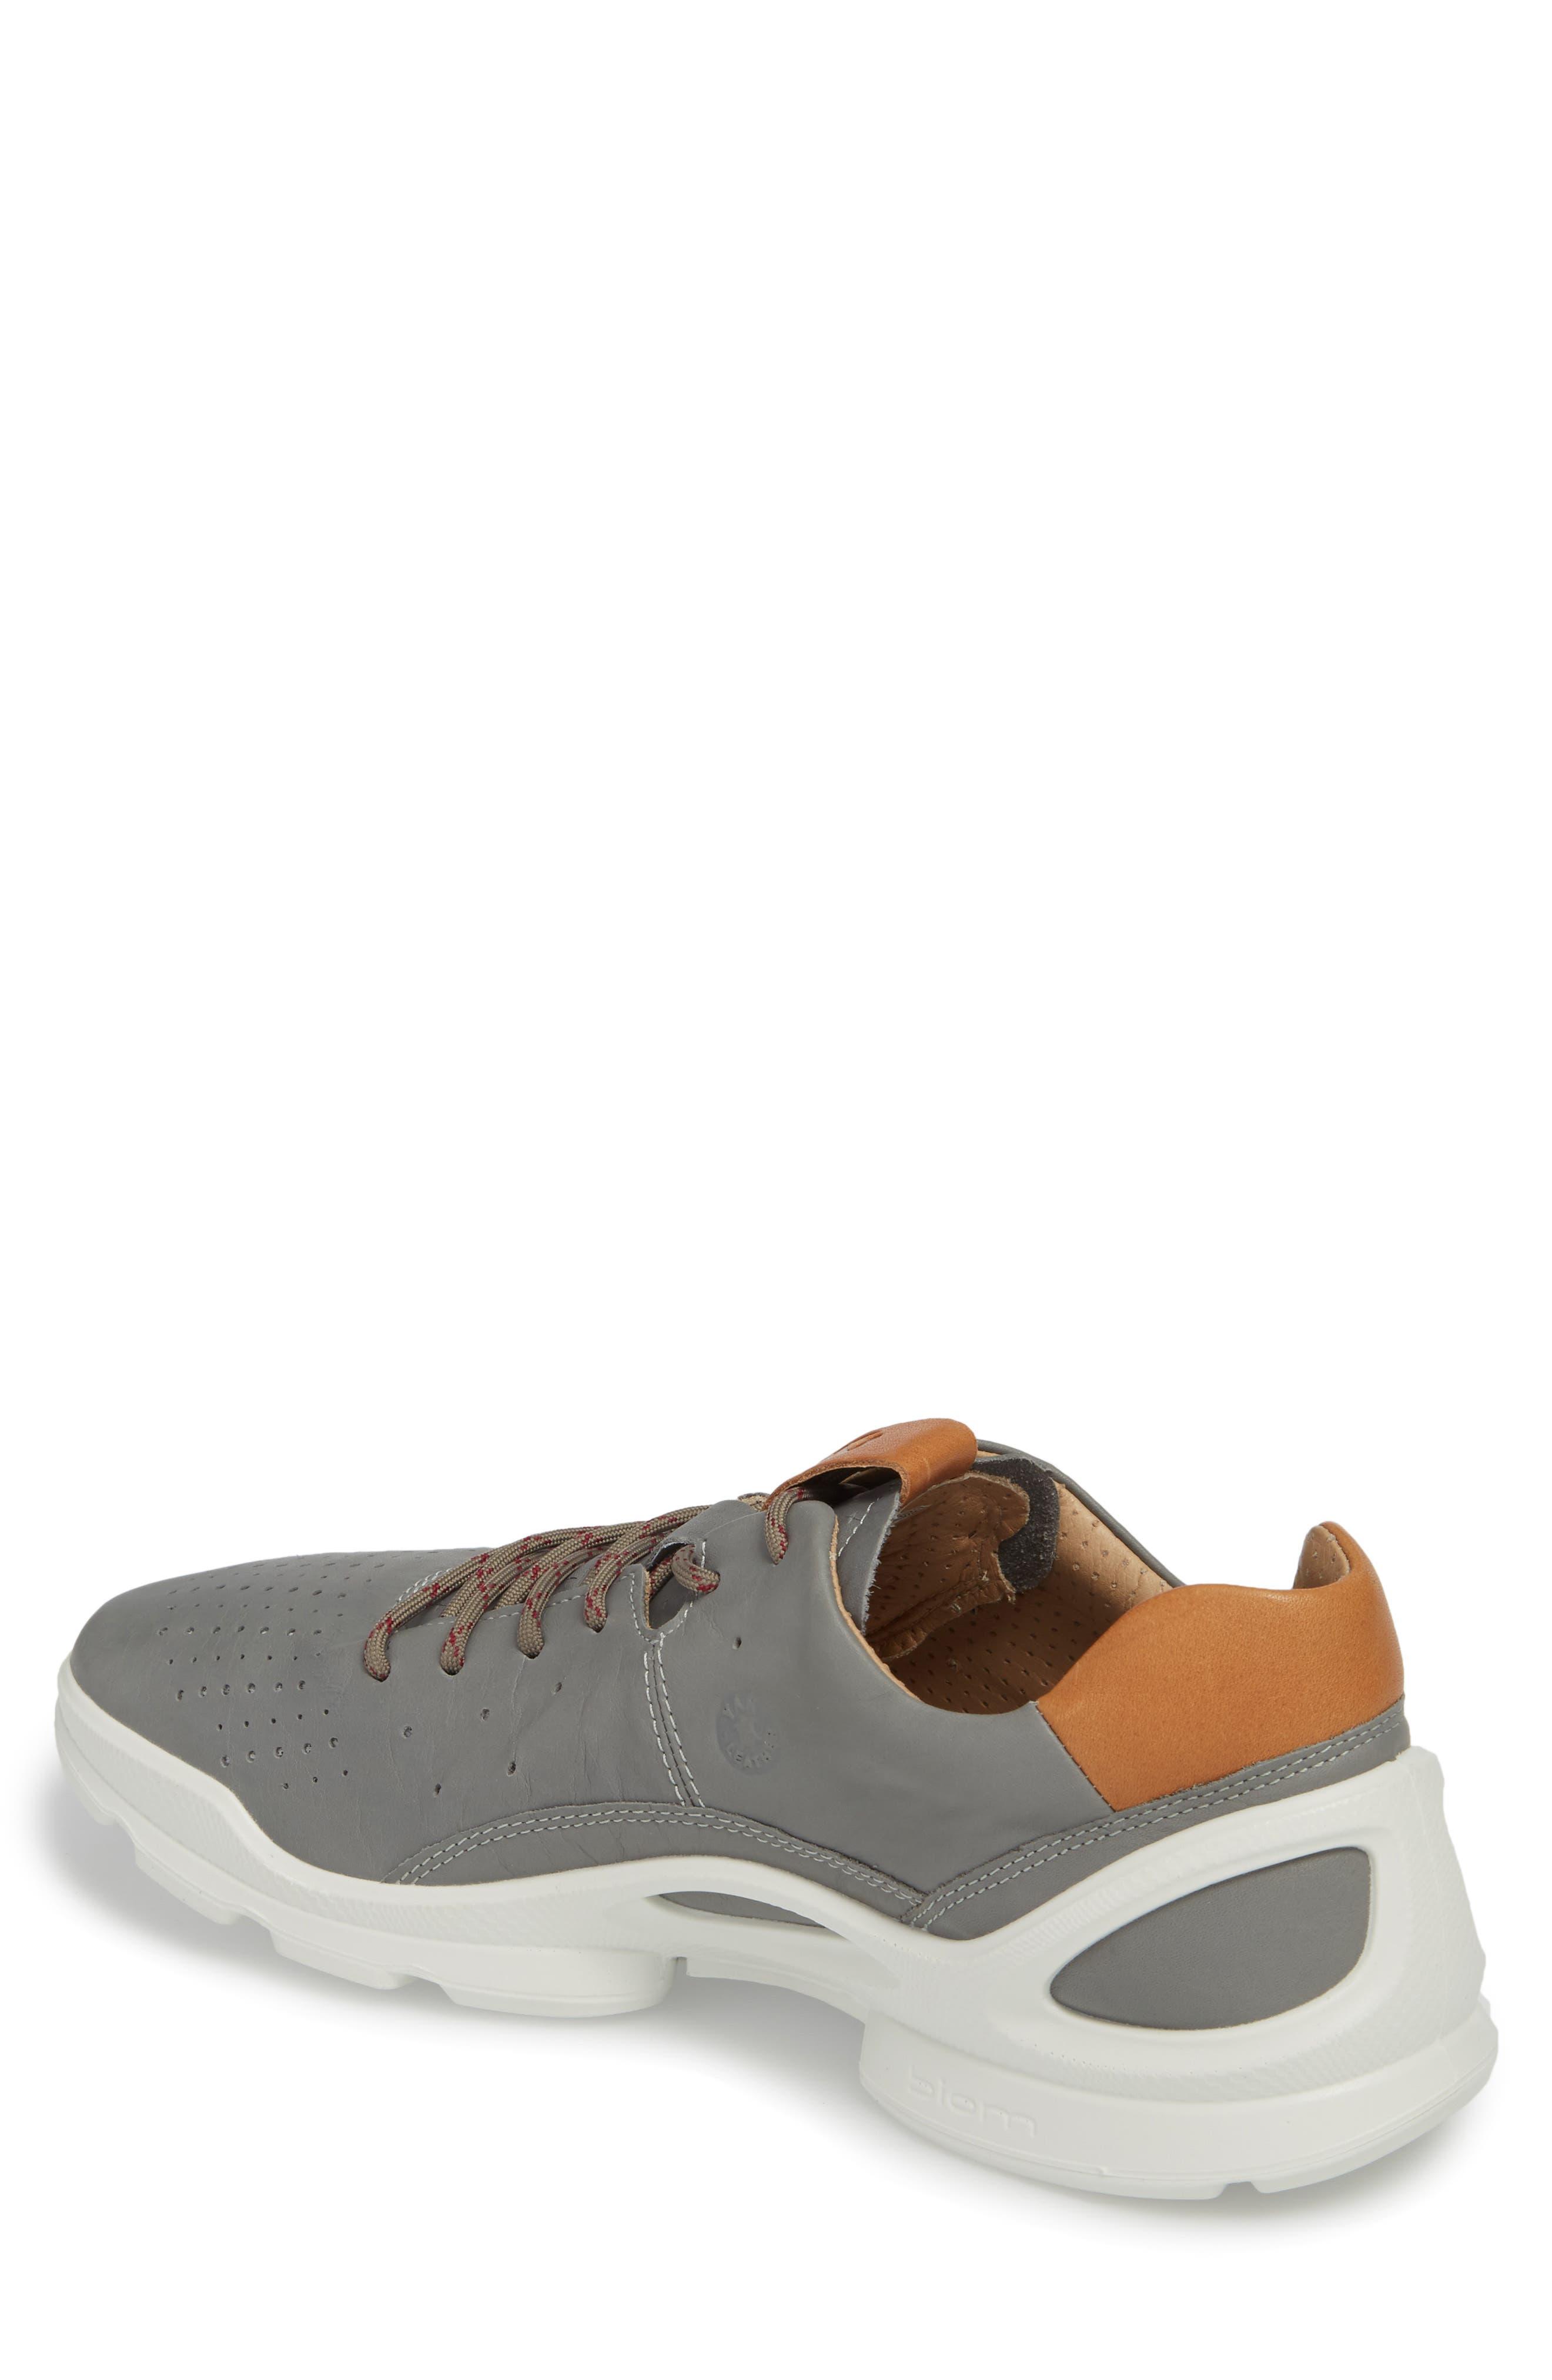 Biom Street Sneaker,                             Alternate thumbnail 2, color,                             Wild Dove Leather